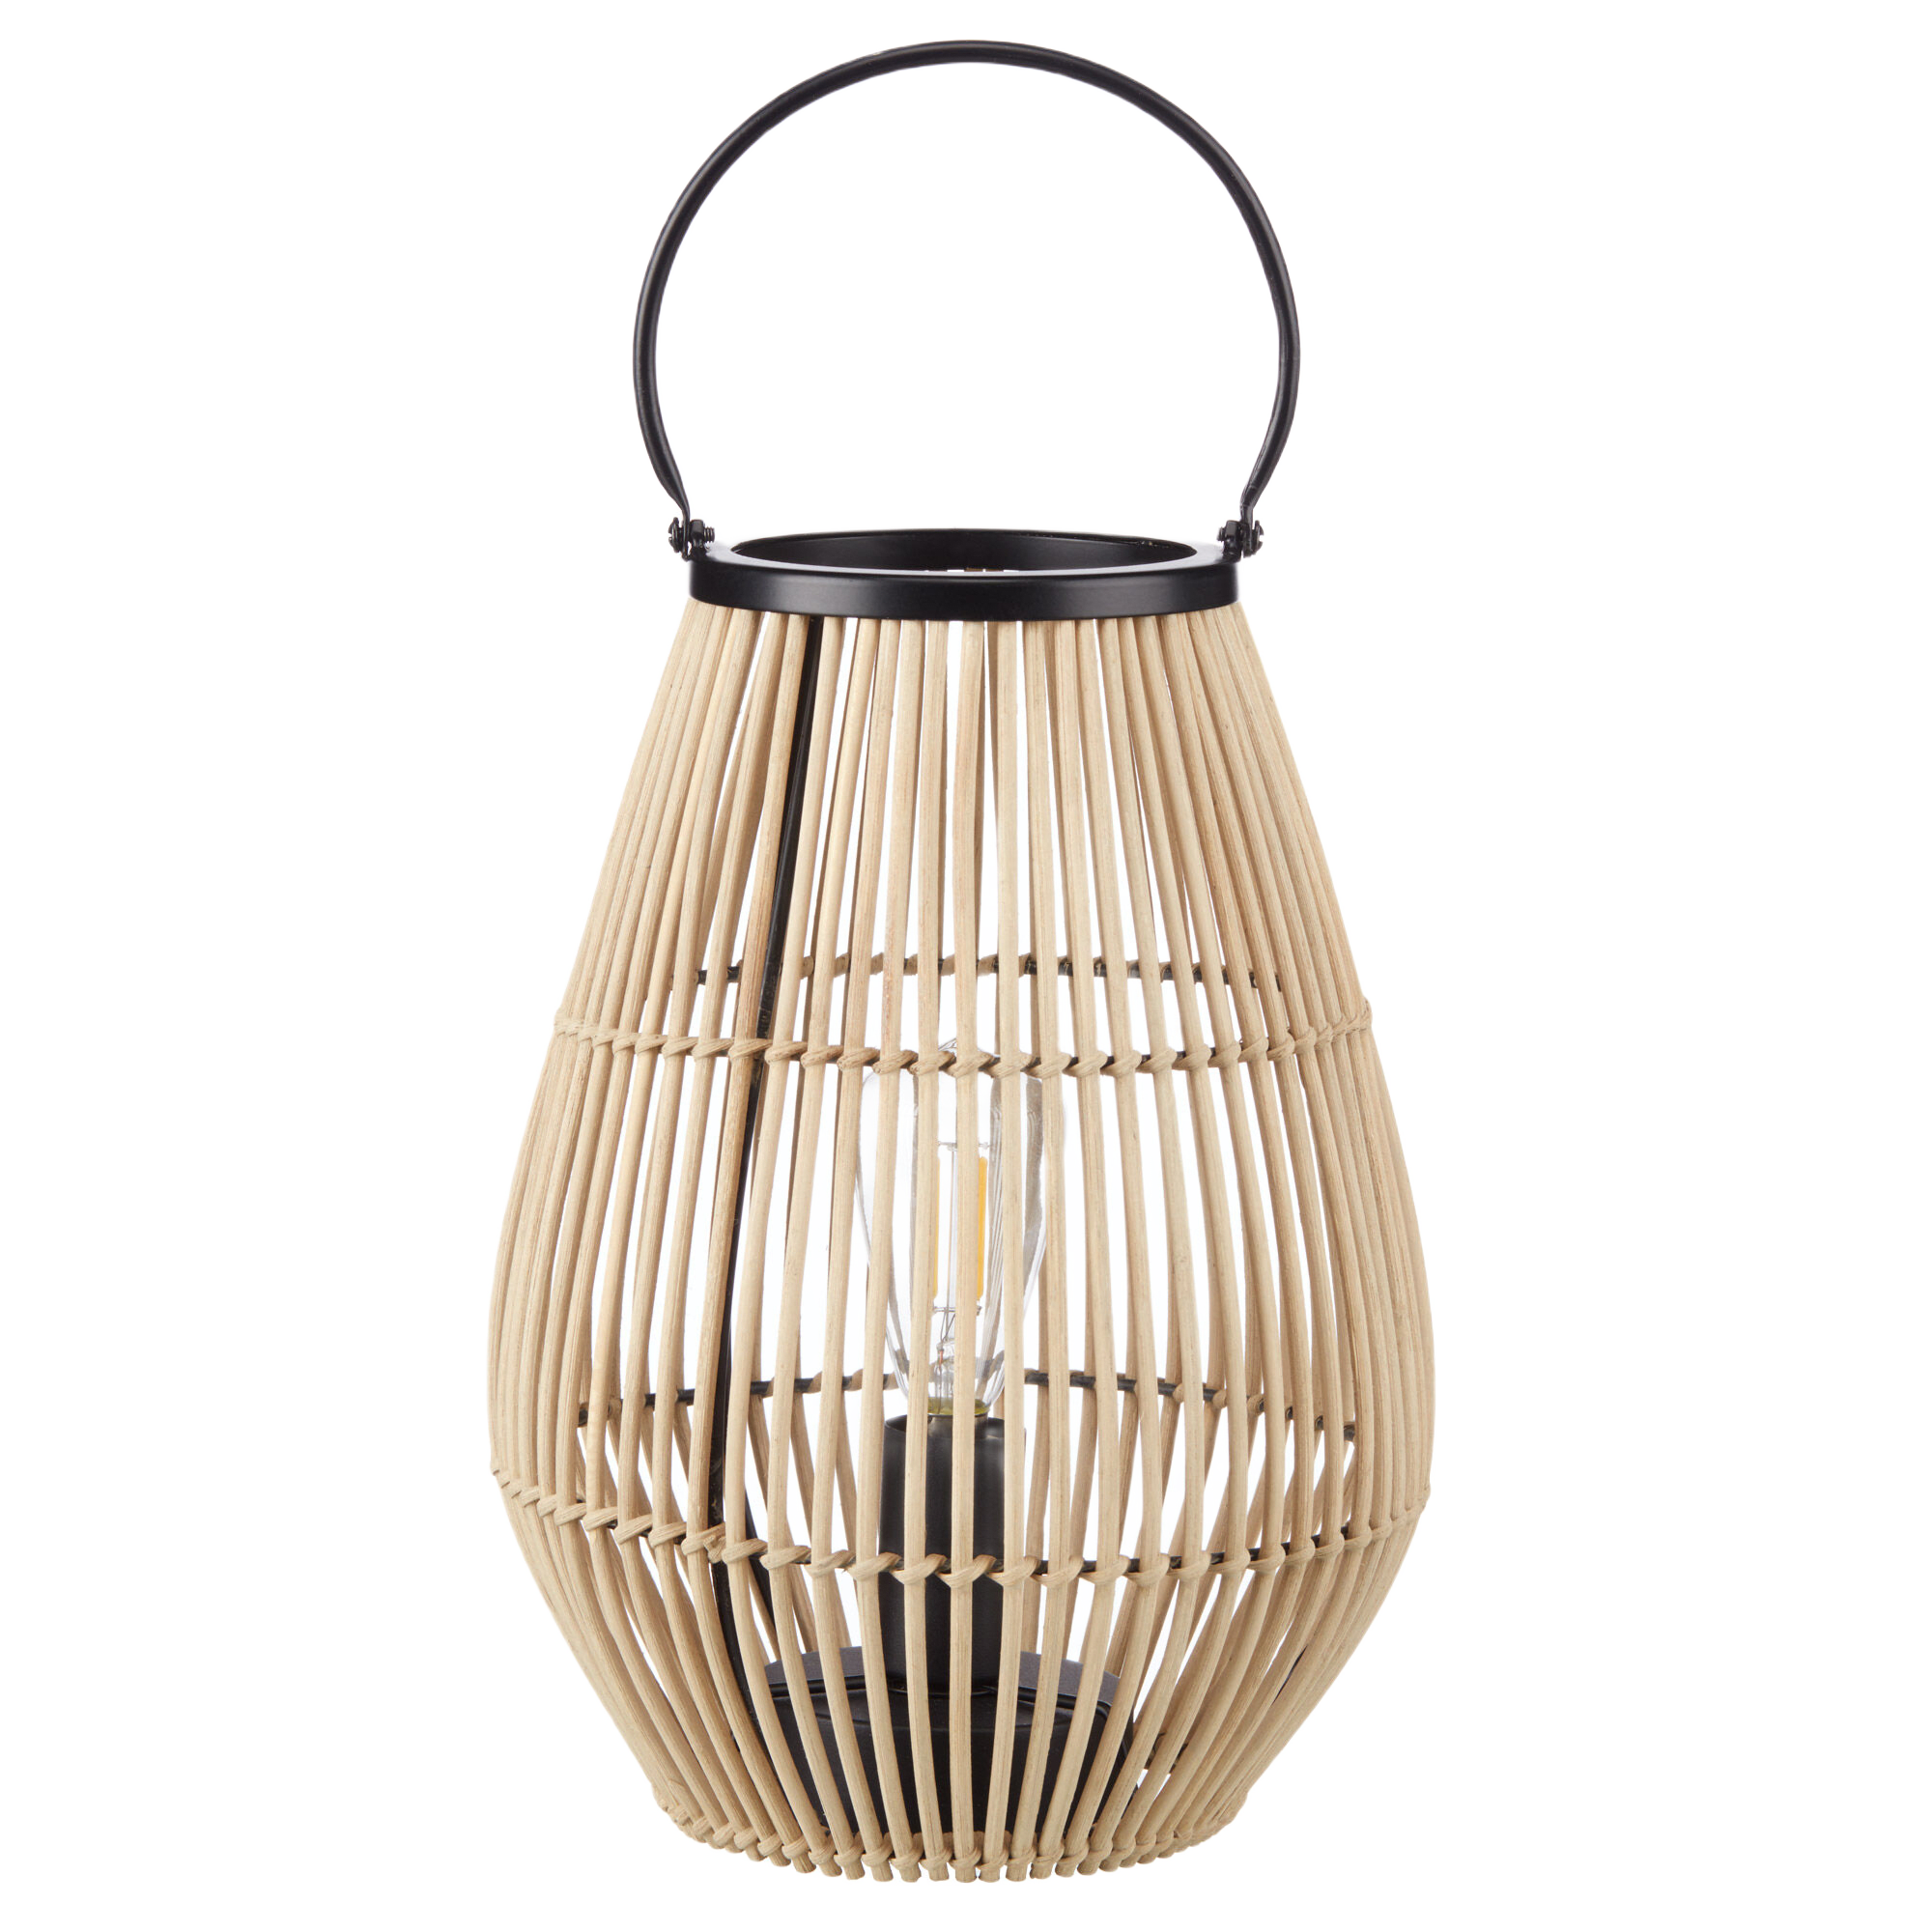 Lampe de table lanterne en rotin naturel